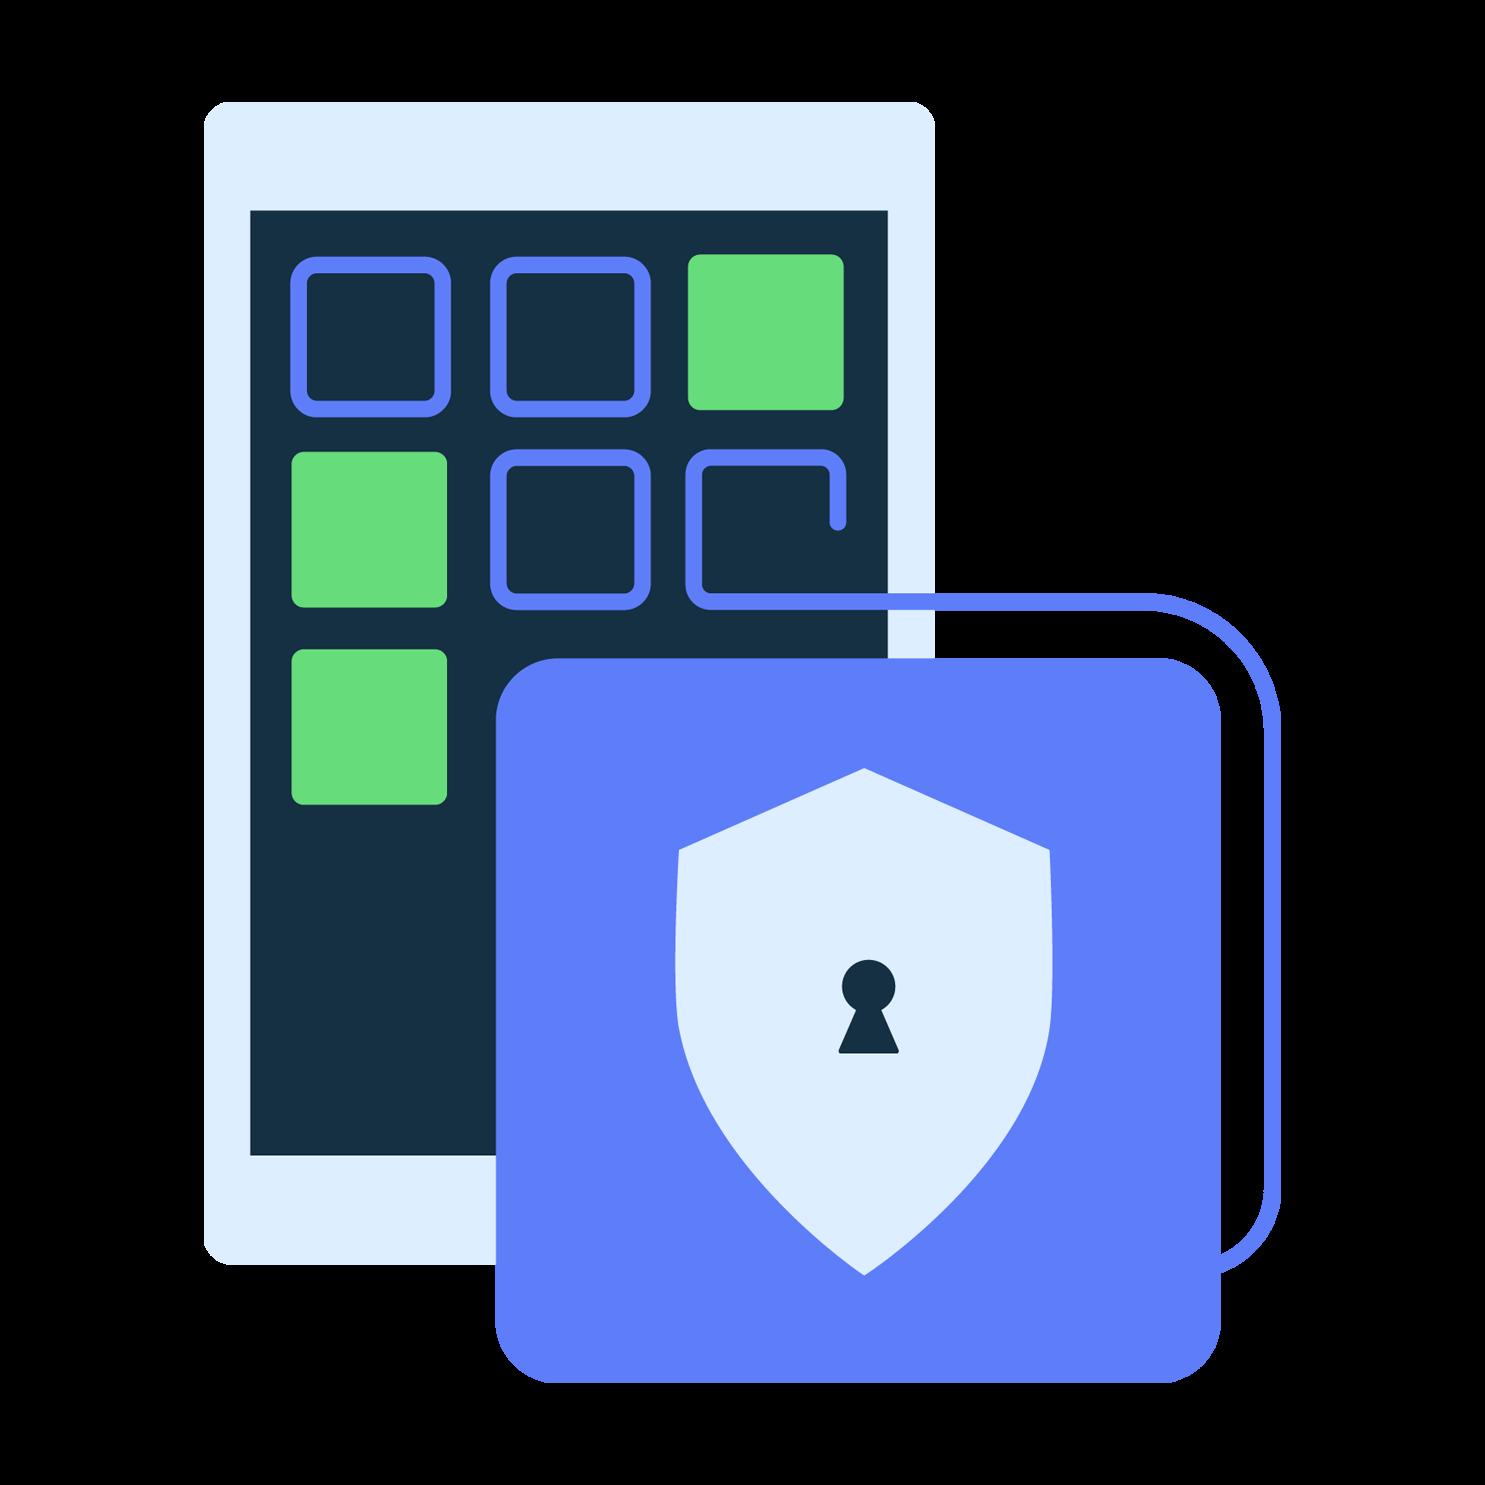 mobile security illustration